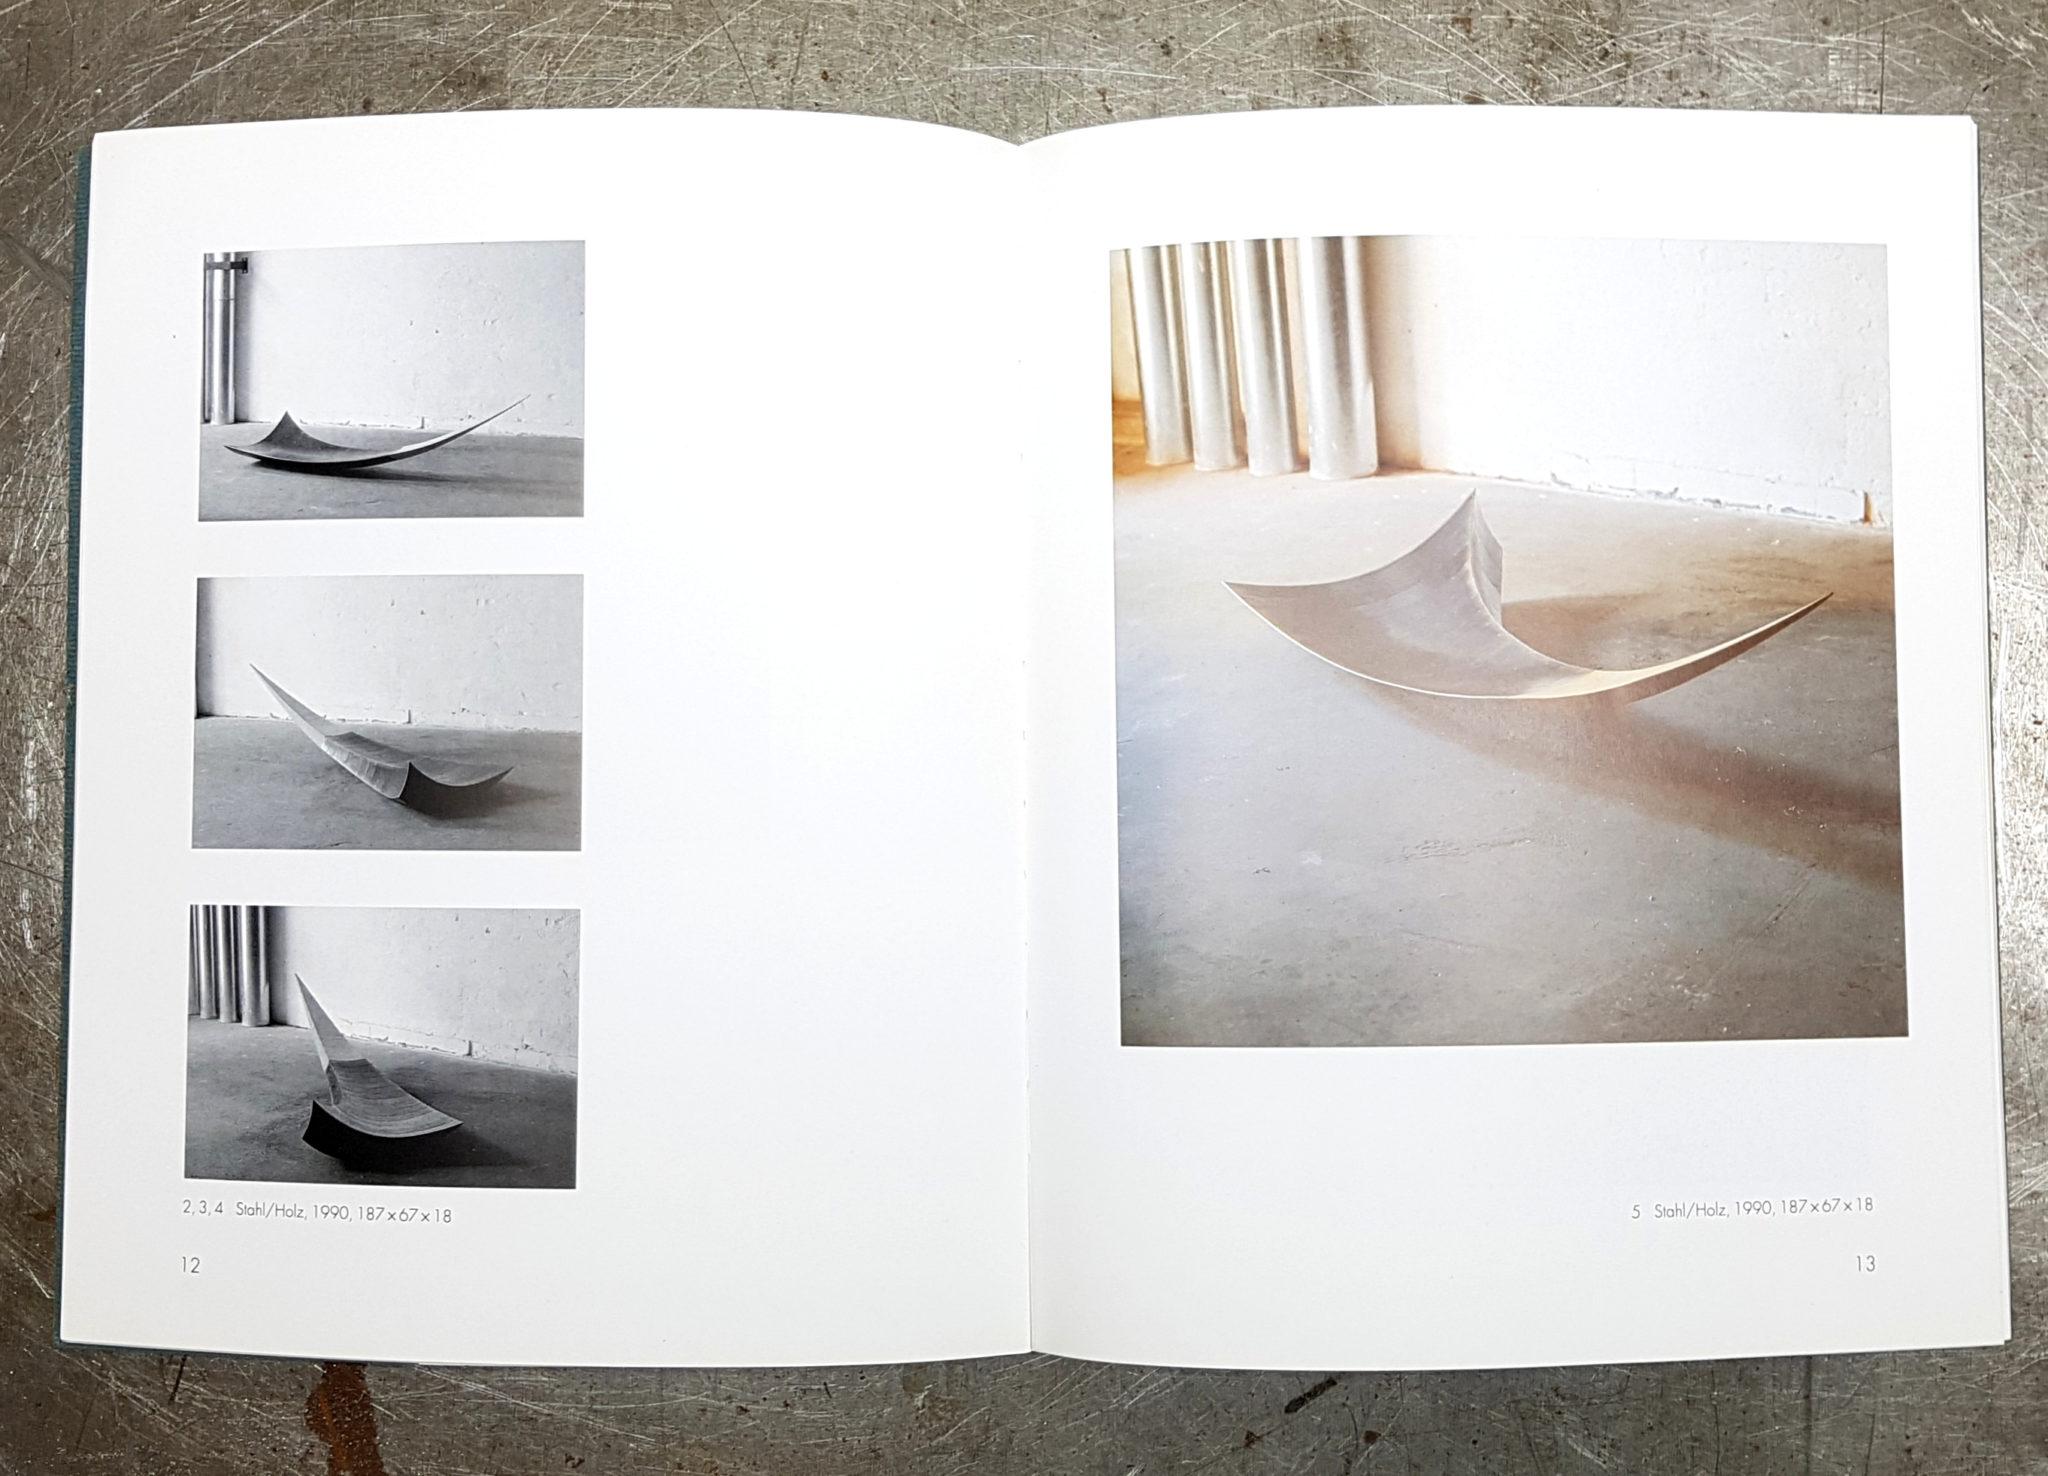 Foto des Katalogs, aufgeklappt